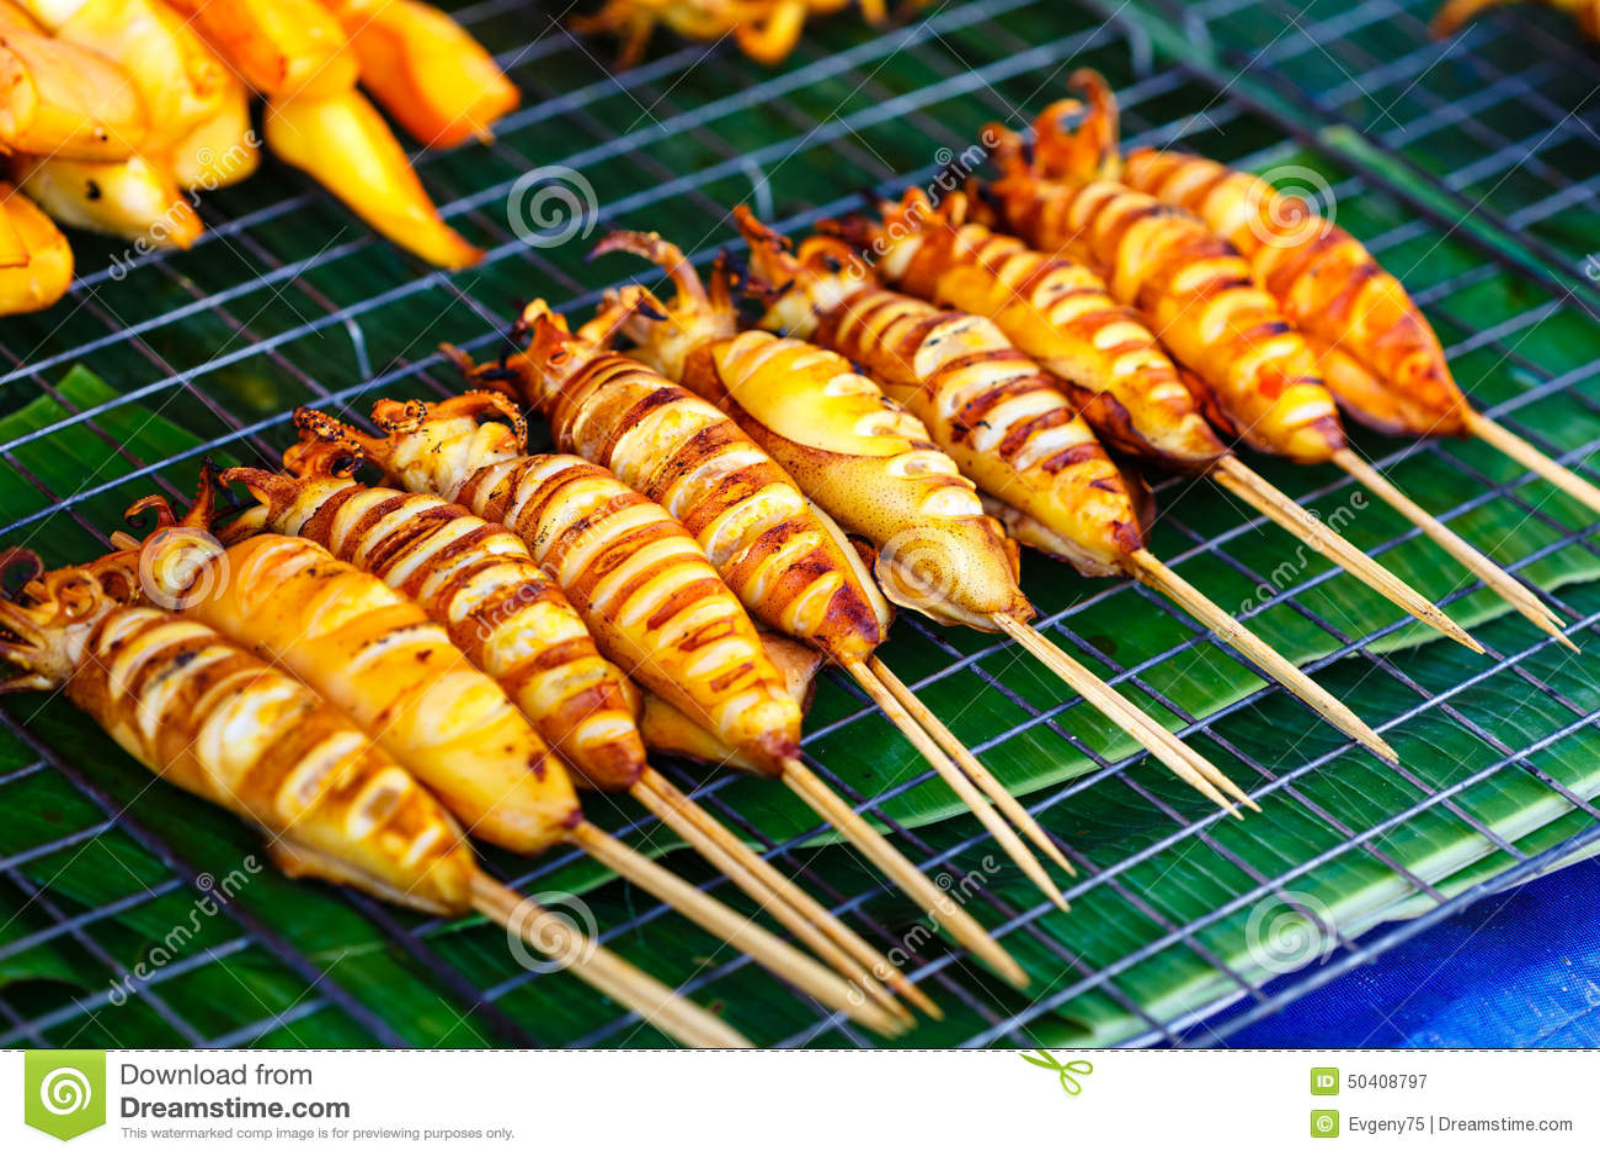 how to make seasoning stick to squid